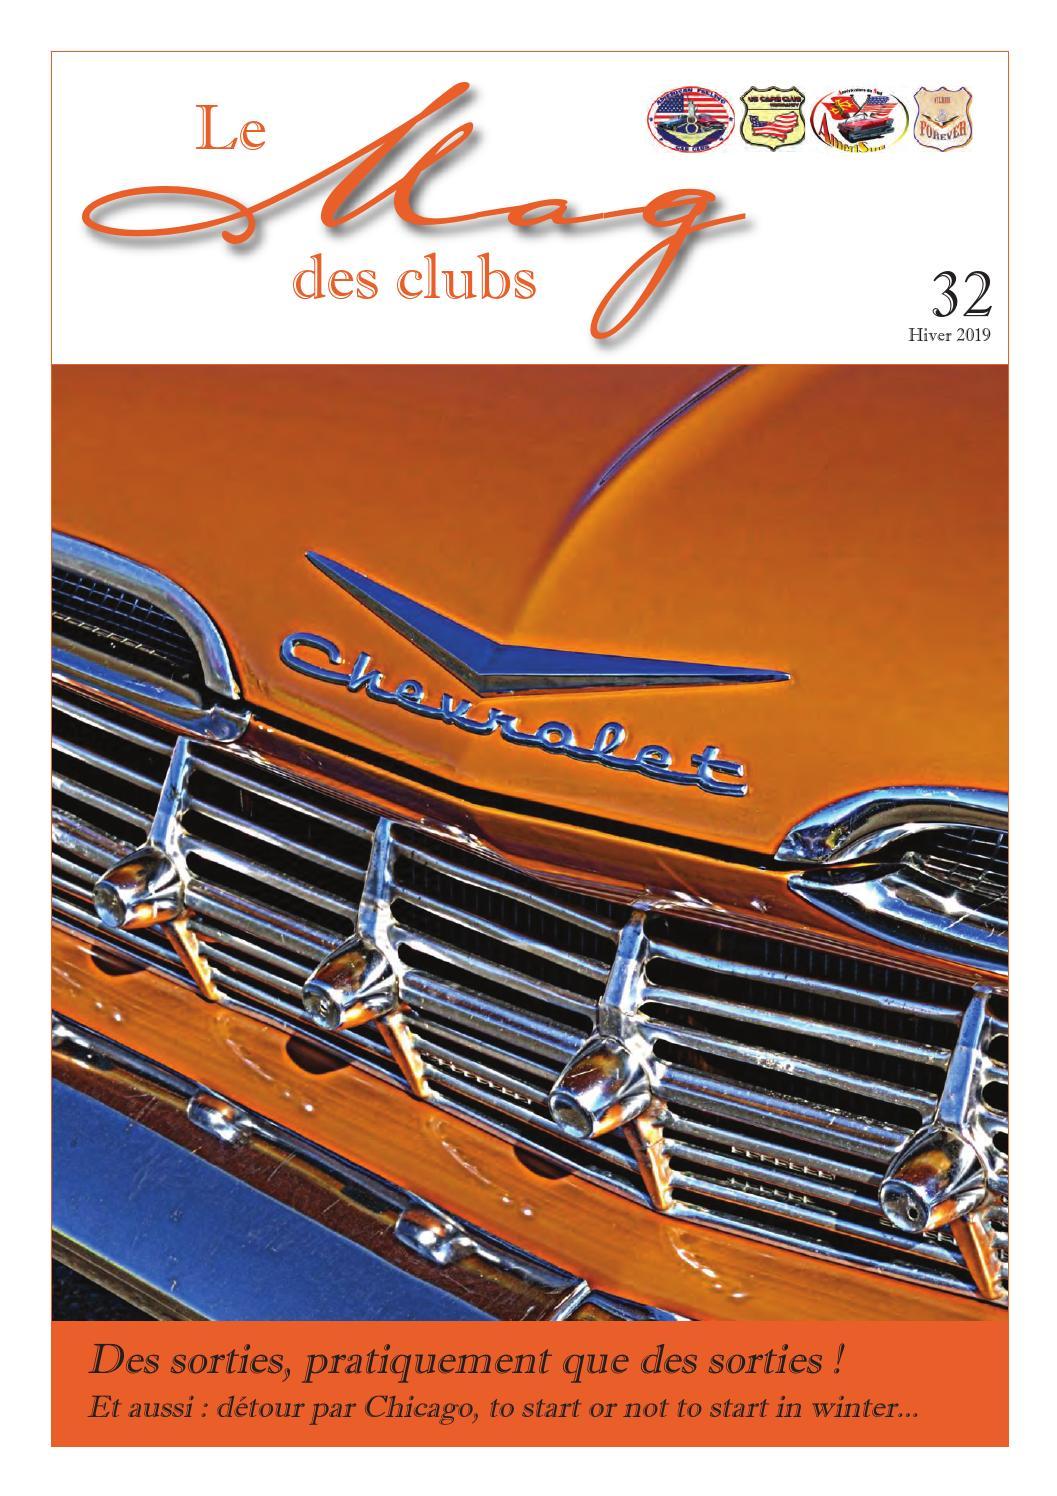 Ambiance Et Deco Idron le mag des clubs #32amerisud - issuu